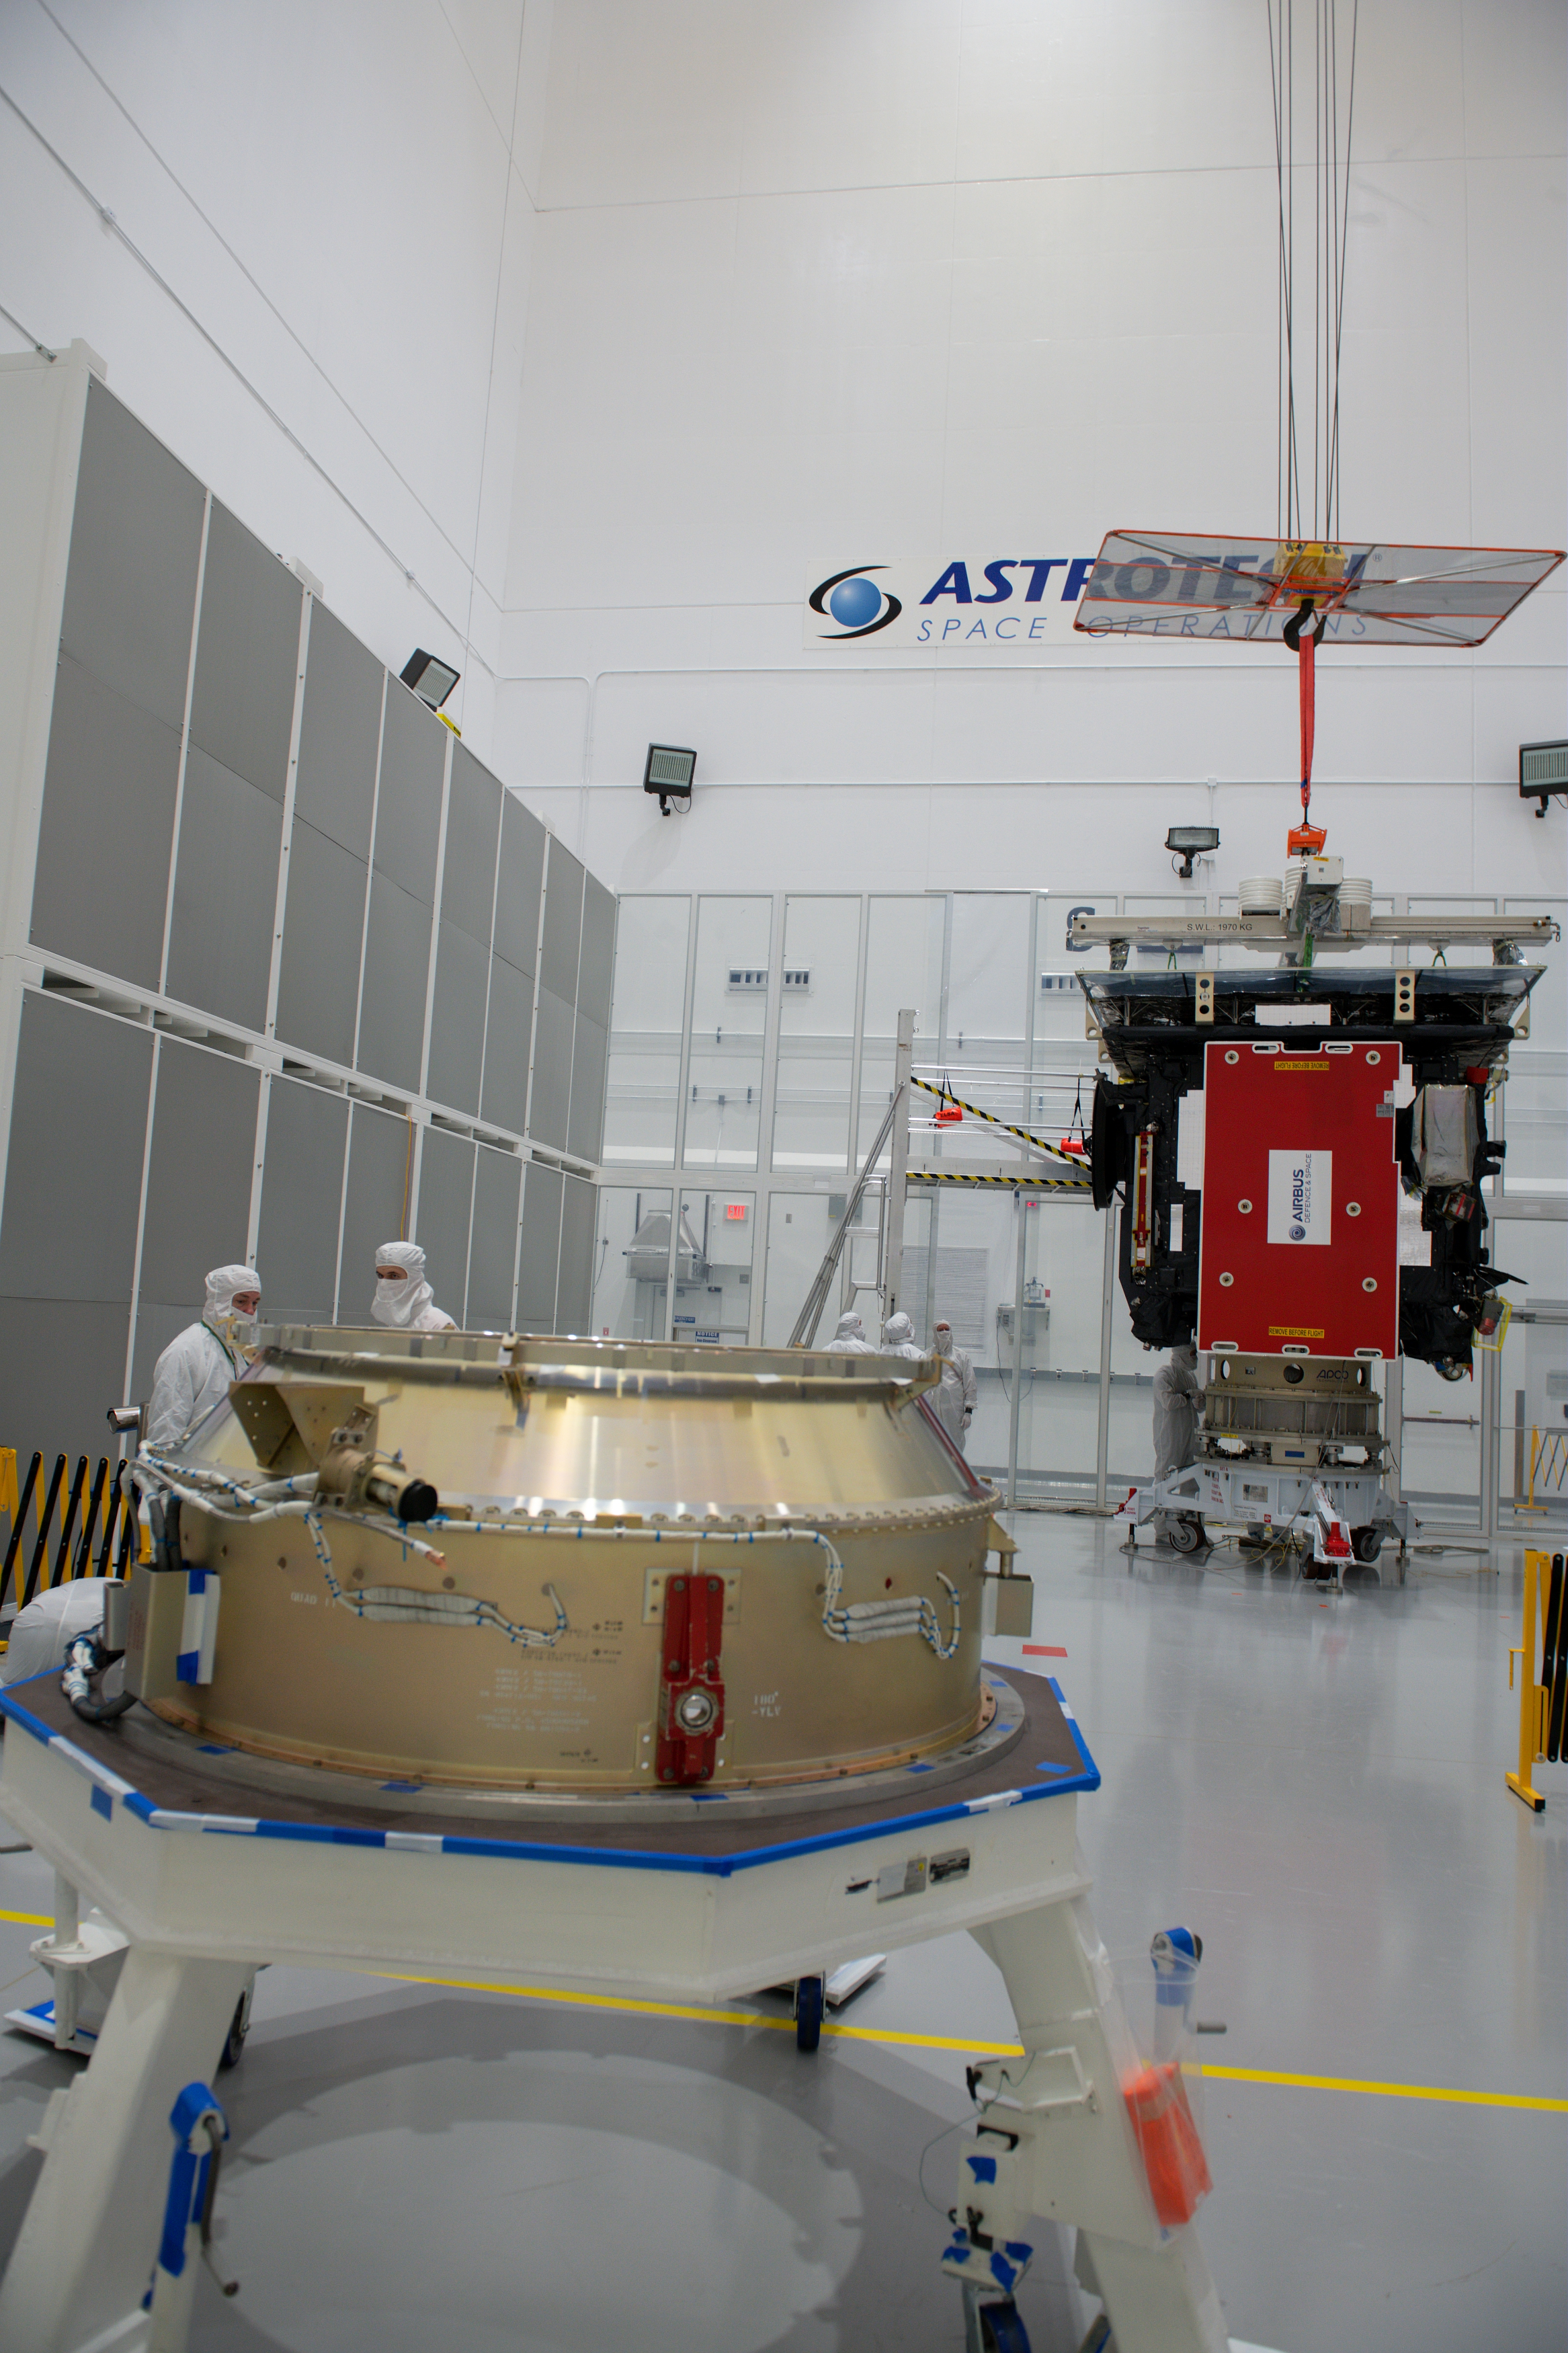 Solar_Orbiter_during_launch_preparations_1.jpg